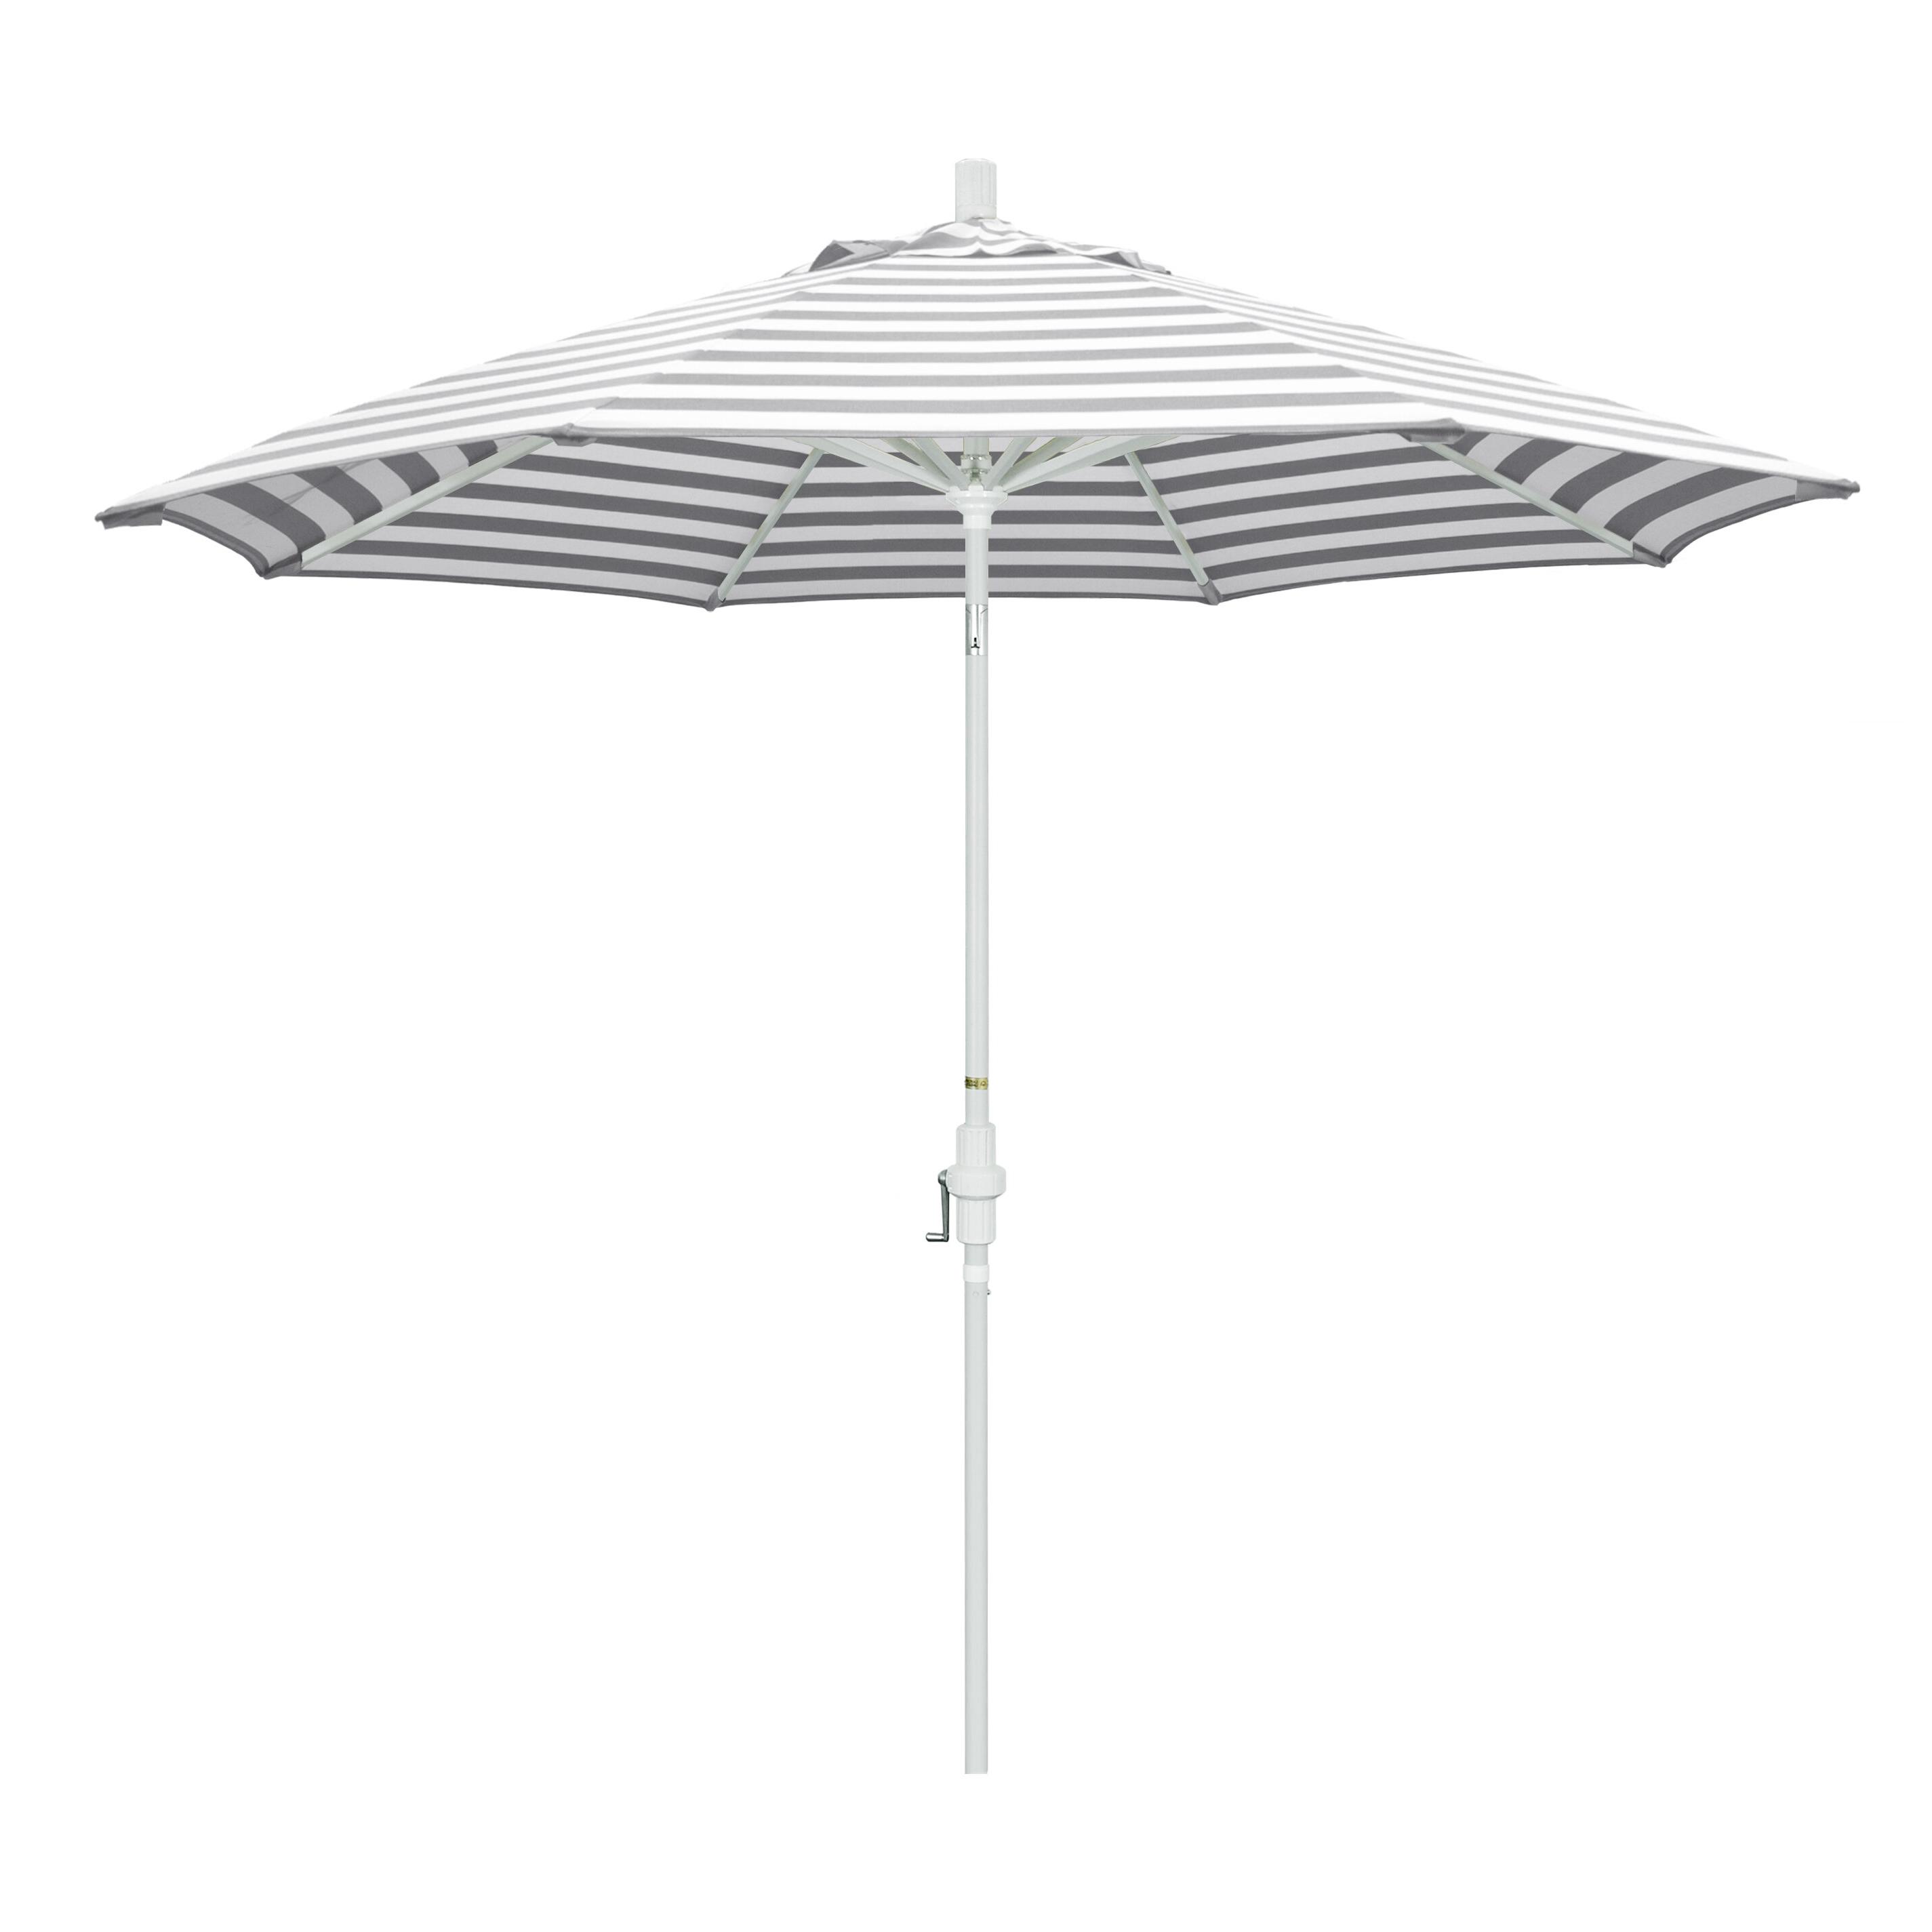 2019 9' Market Umbrella Within Lizarraga Market Umbrellas (View 3 of 20)